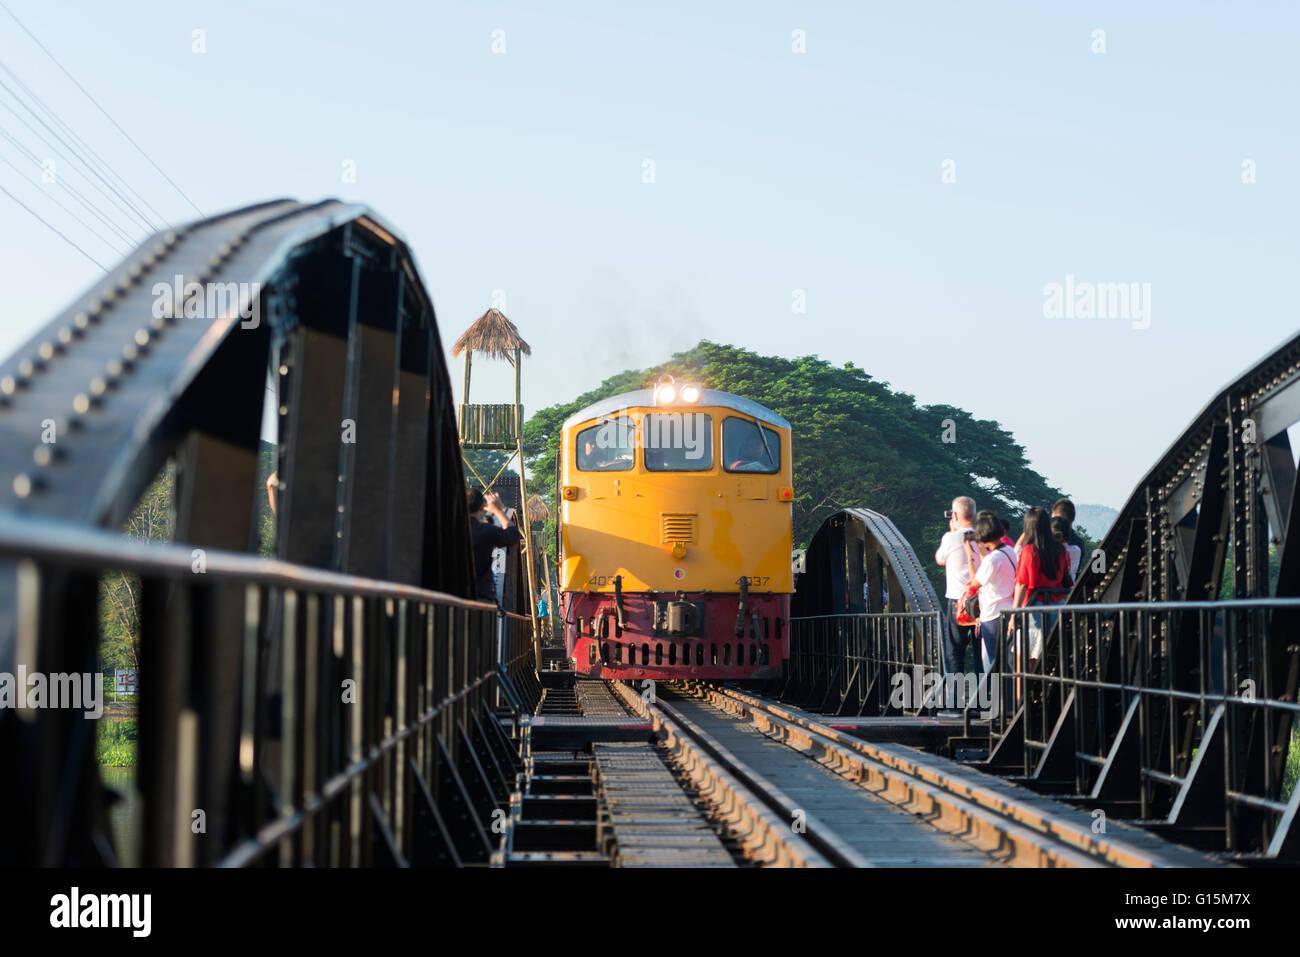 Train crossing the Bridge over the River Kwai, Kanchanaburi, Thailand, Southeast Asia, Asia - Stock Image